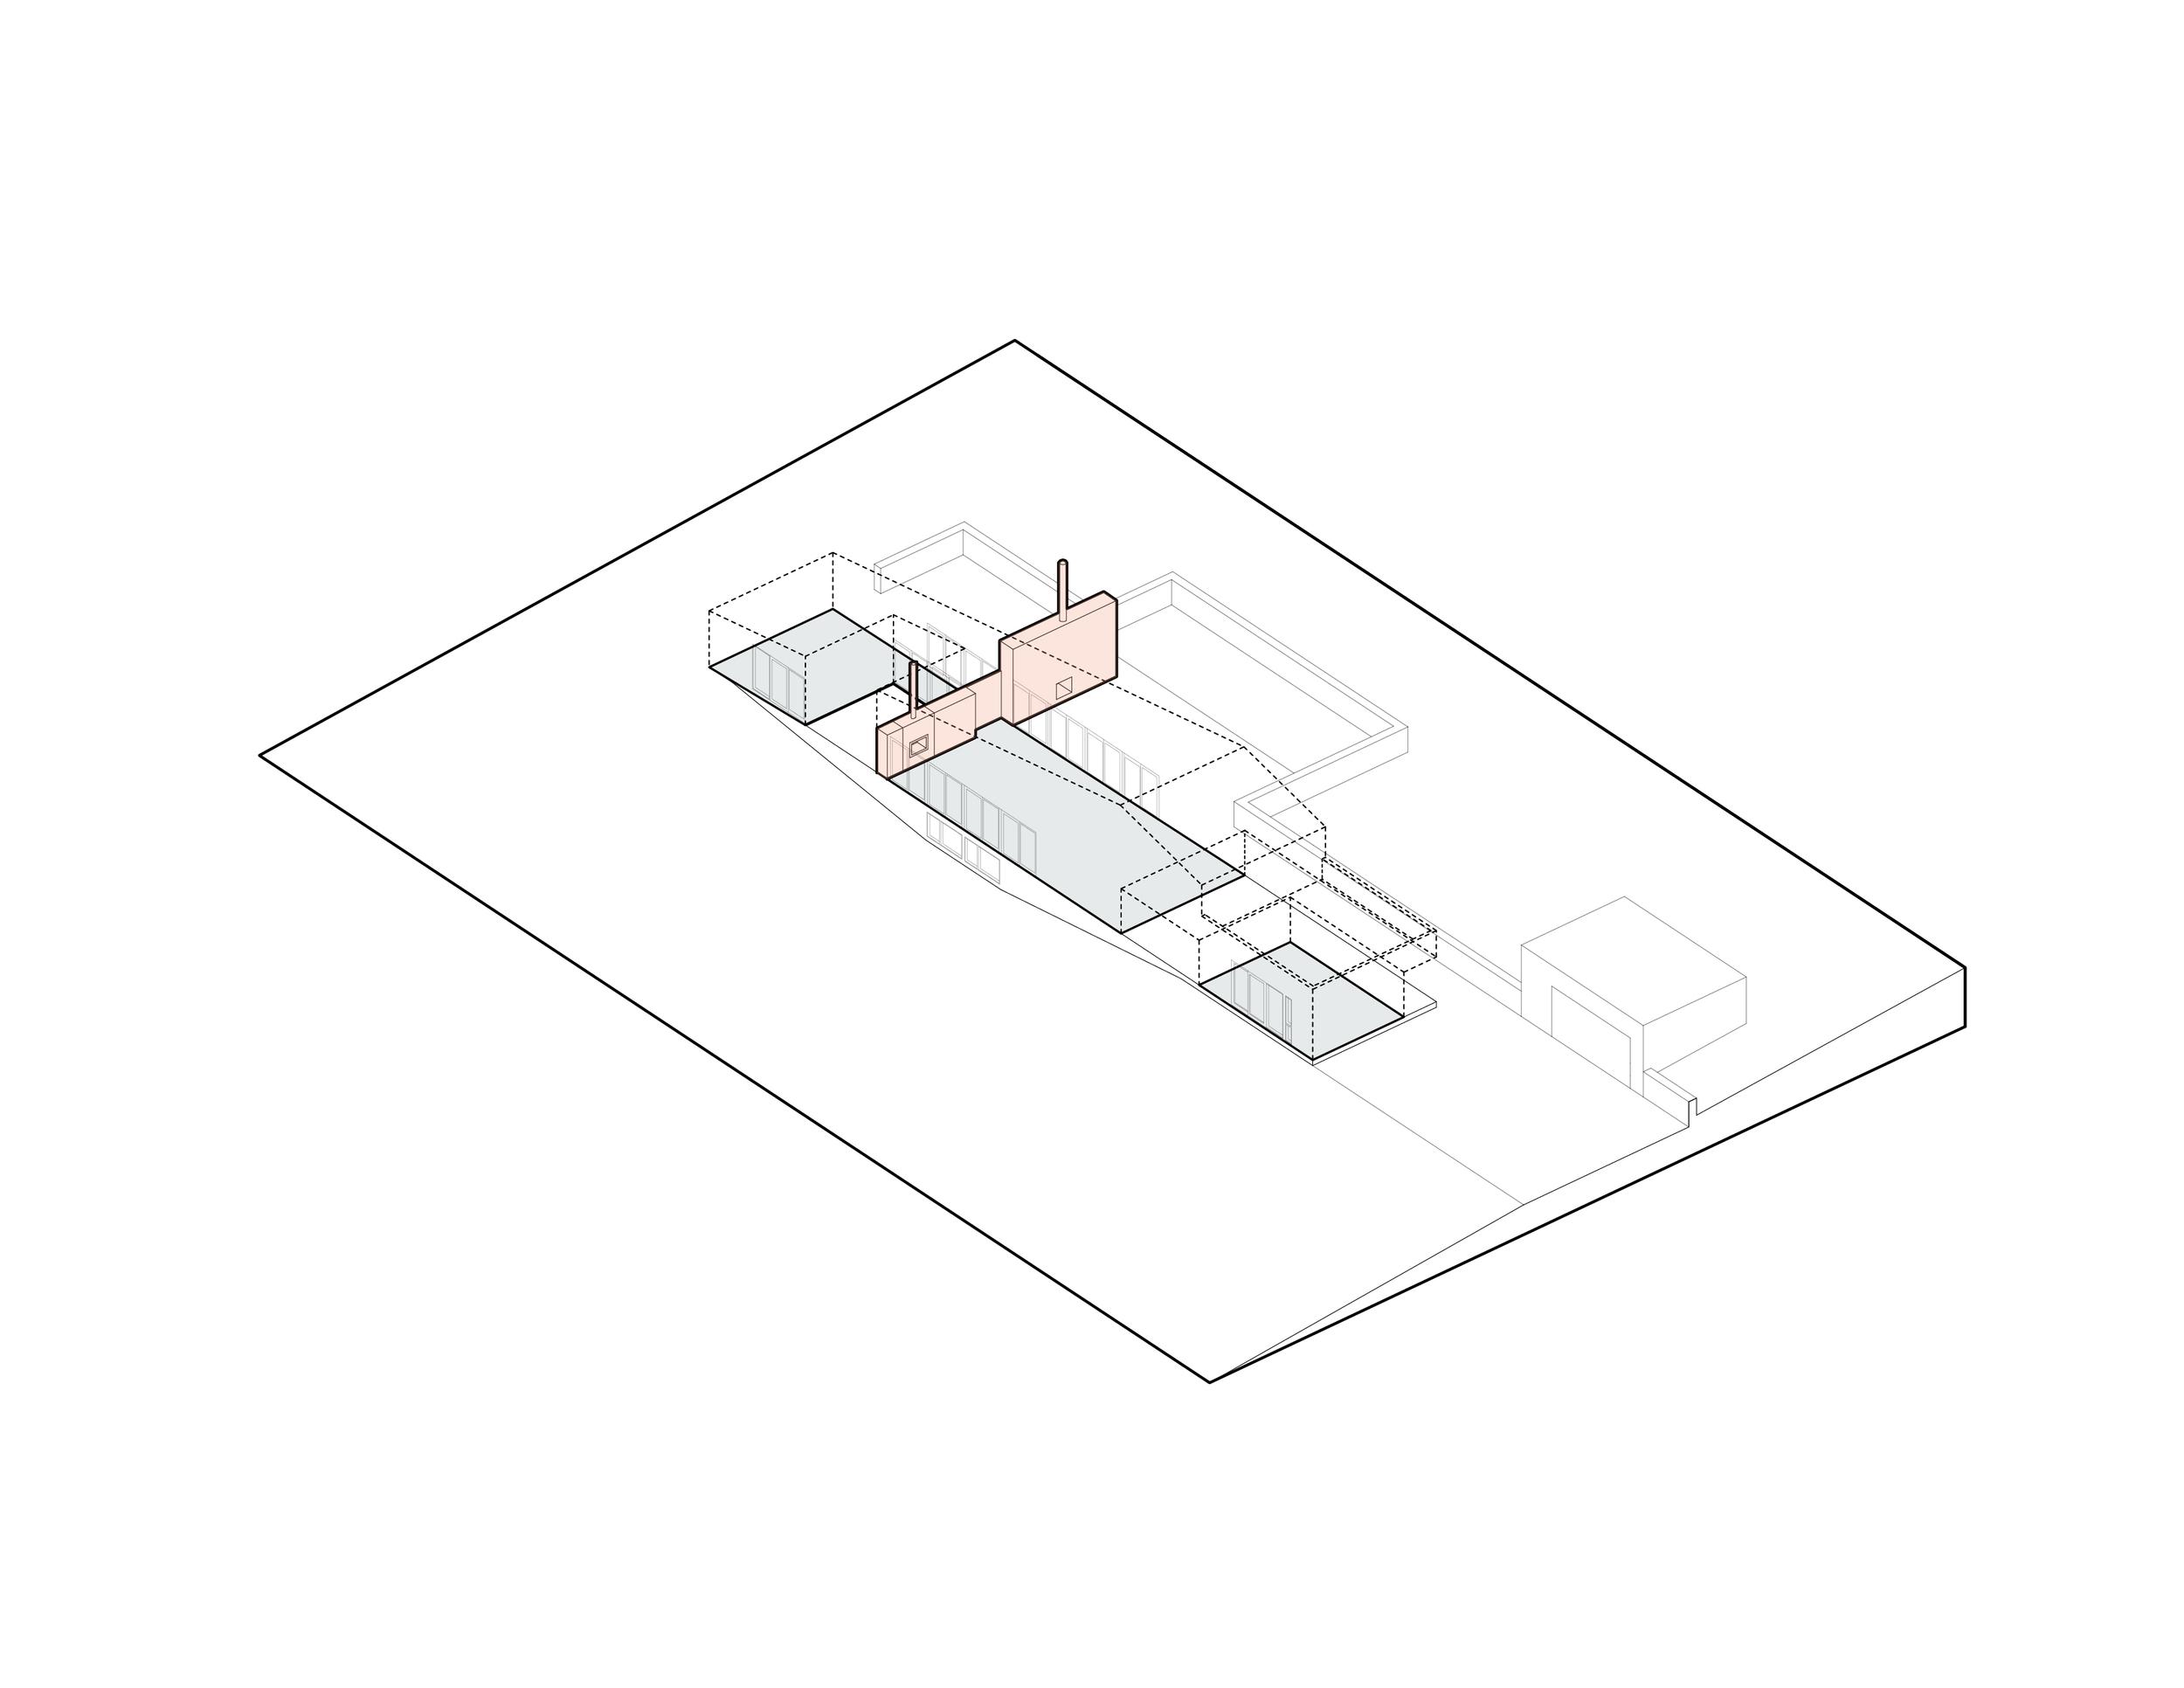 1407_10_Diagrams_Hearth-01.jpg